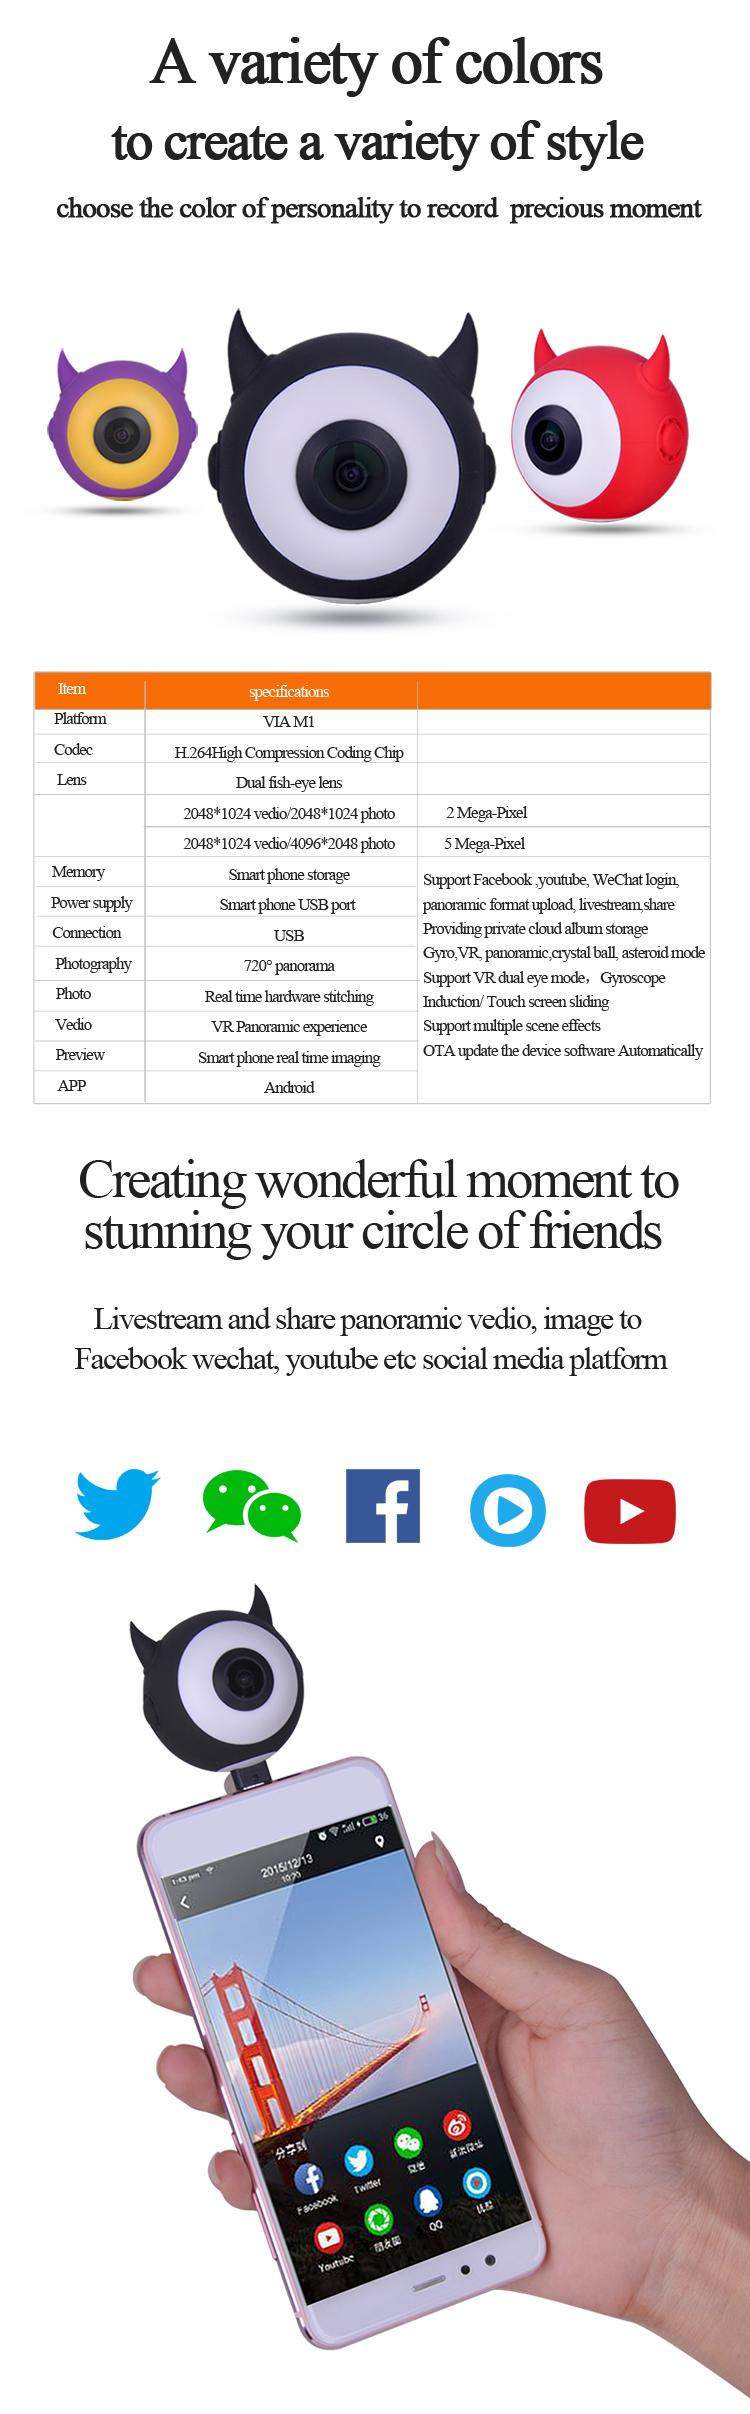 Kemera Live Streaming Camera360 Online 360 Vr Panoramic Camera - Buy  Camera360 Online,360 Live Streaming Camera,Camera 360 New Product on  Alibaba com